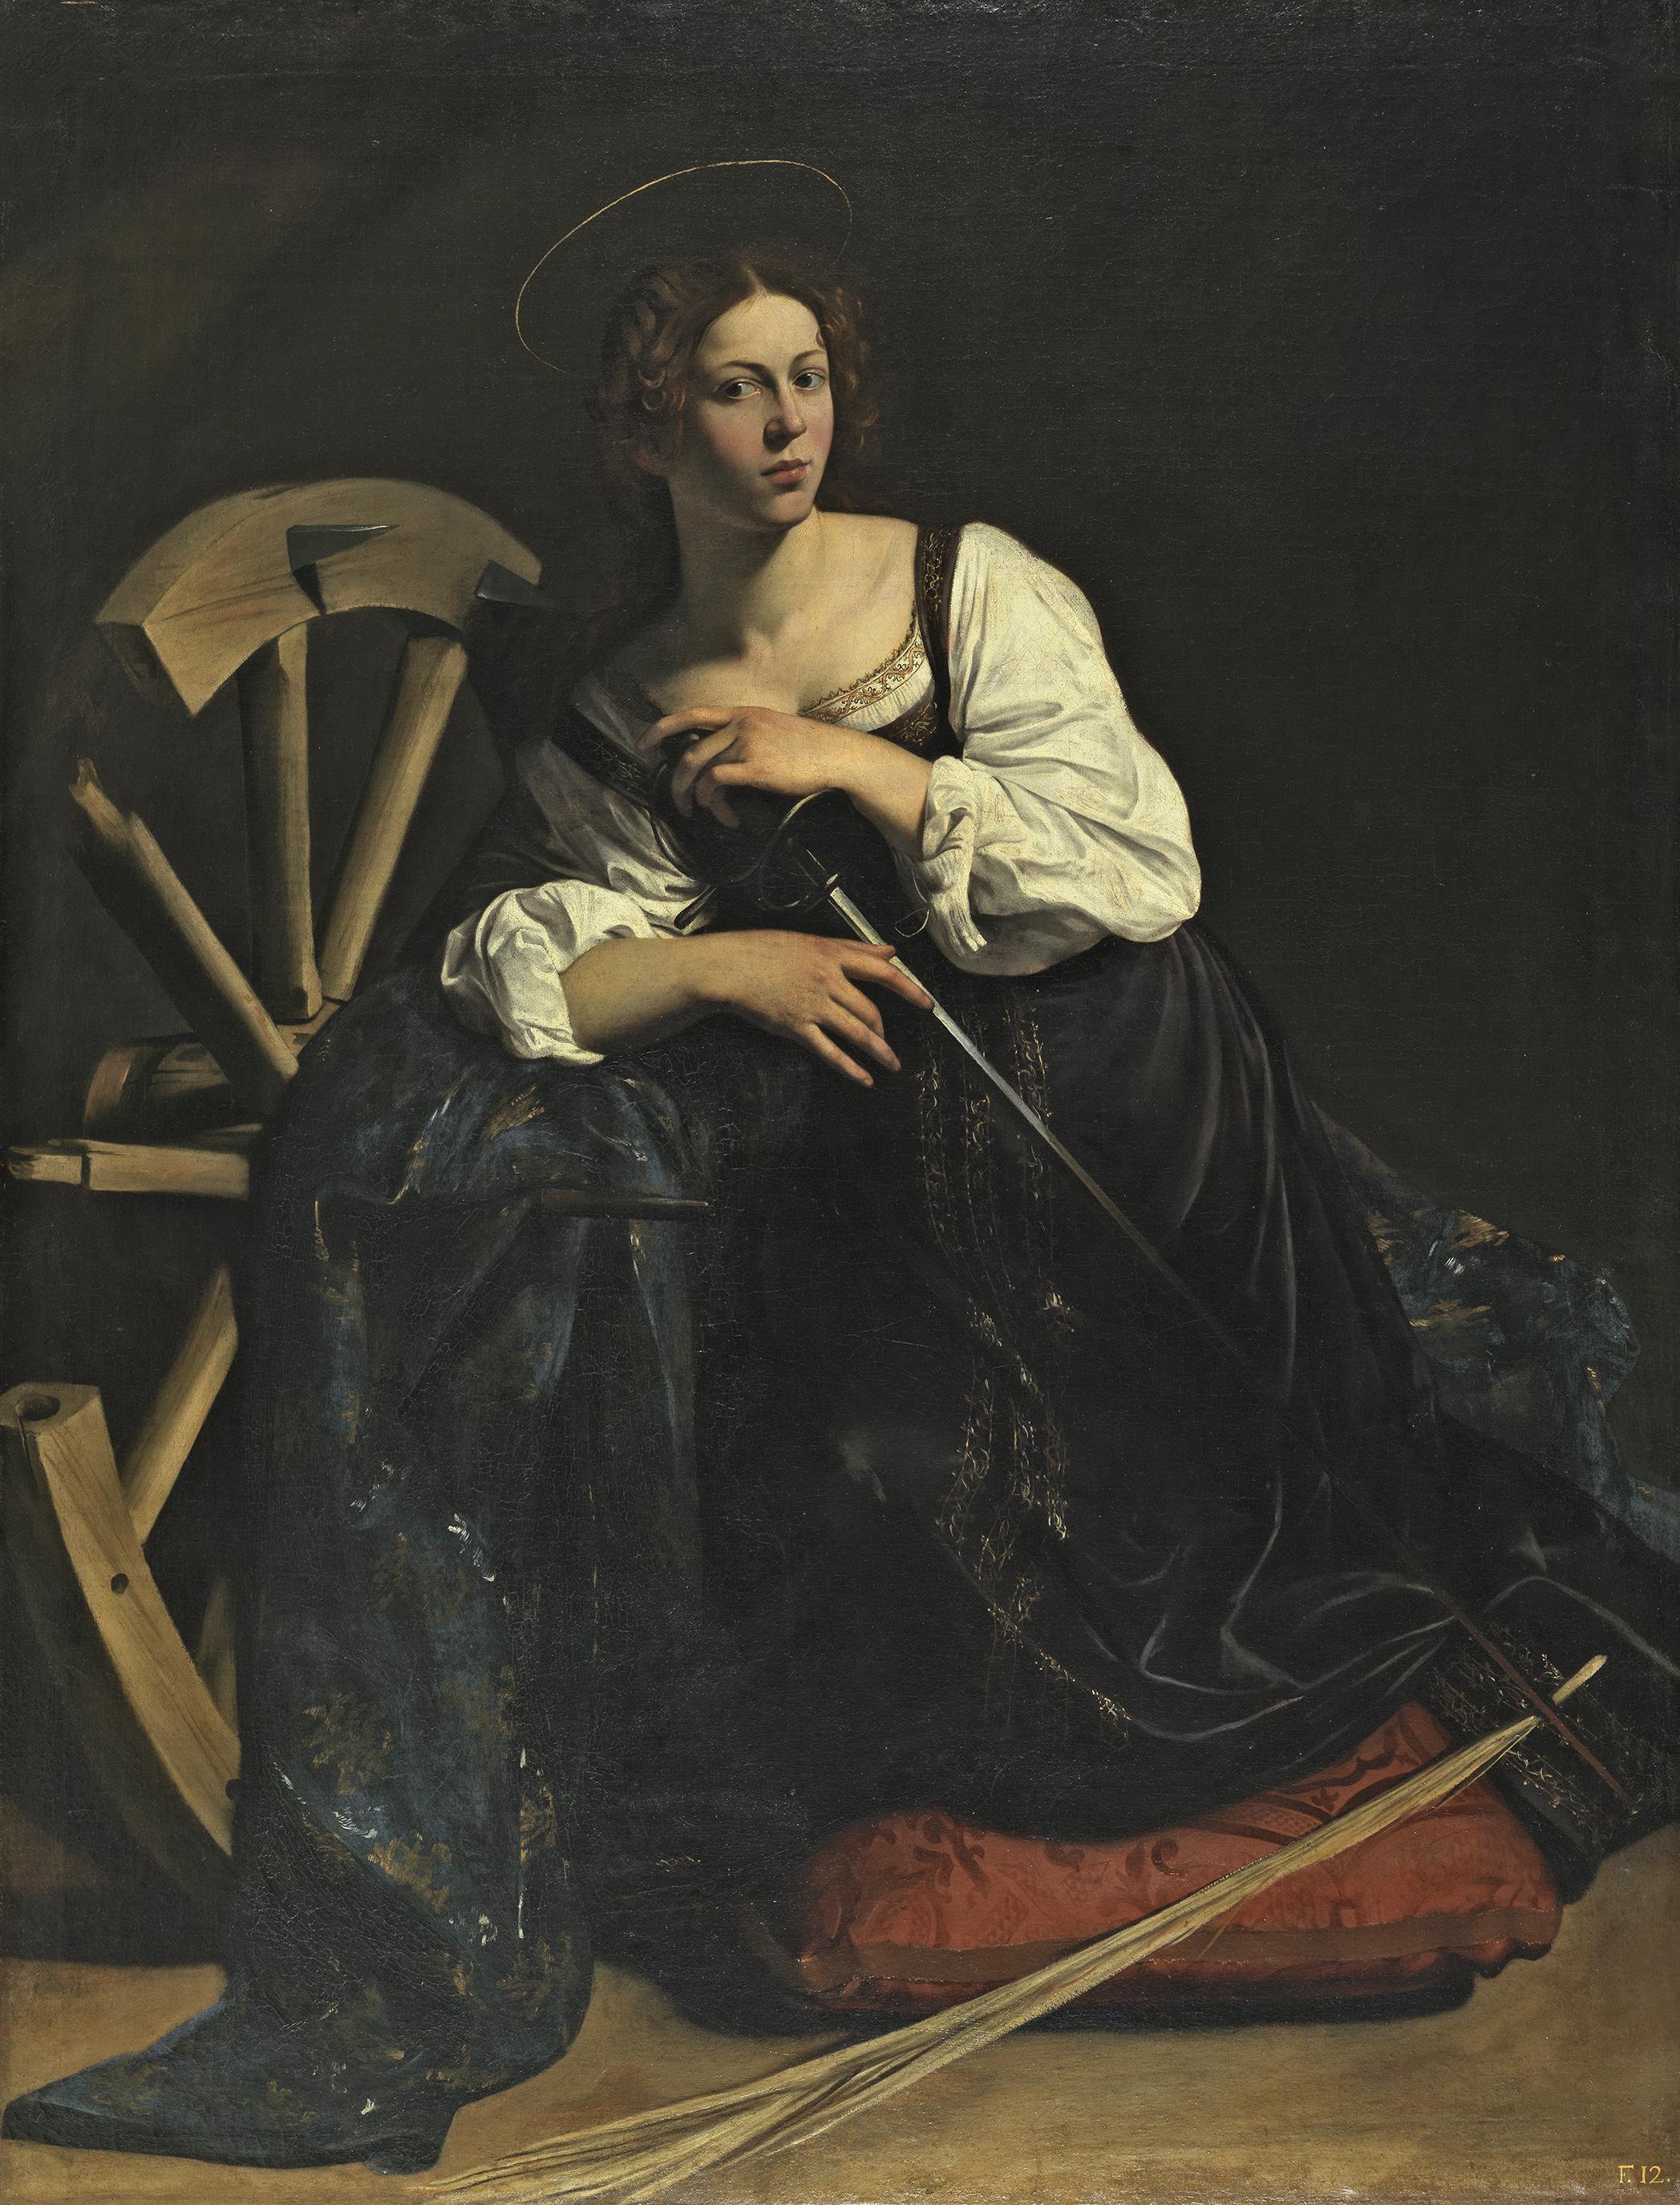 Fillide Melandroni como Santa Catalina